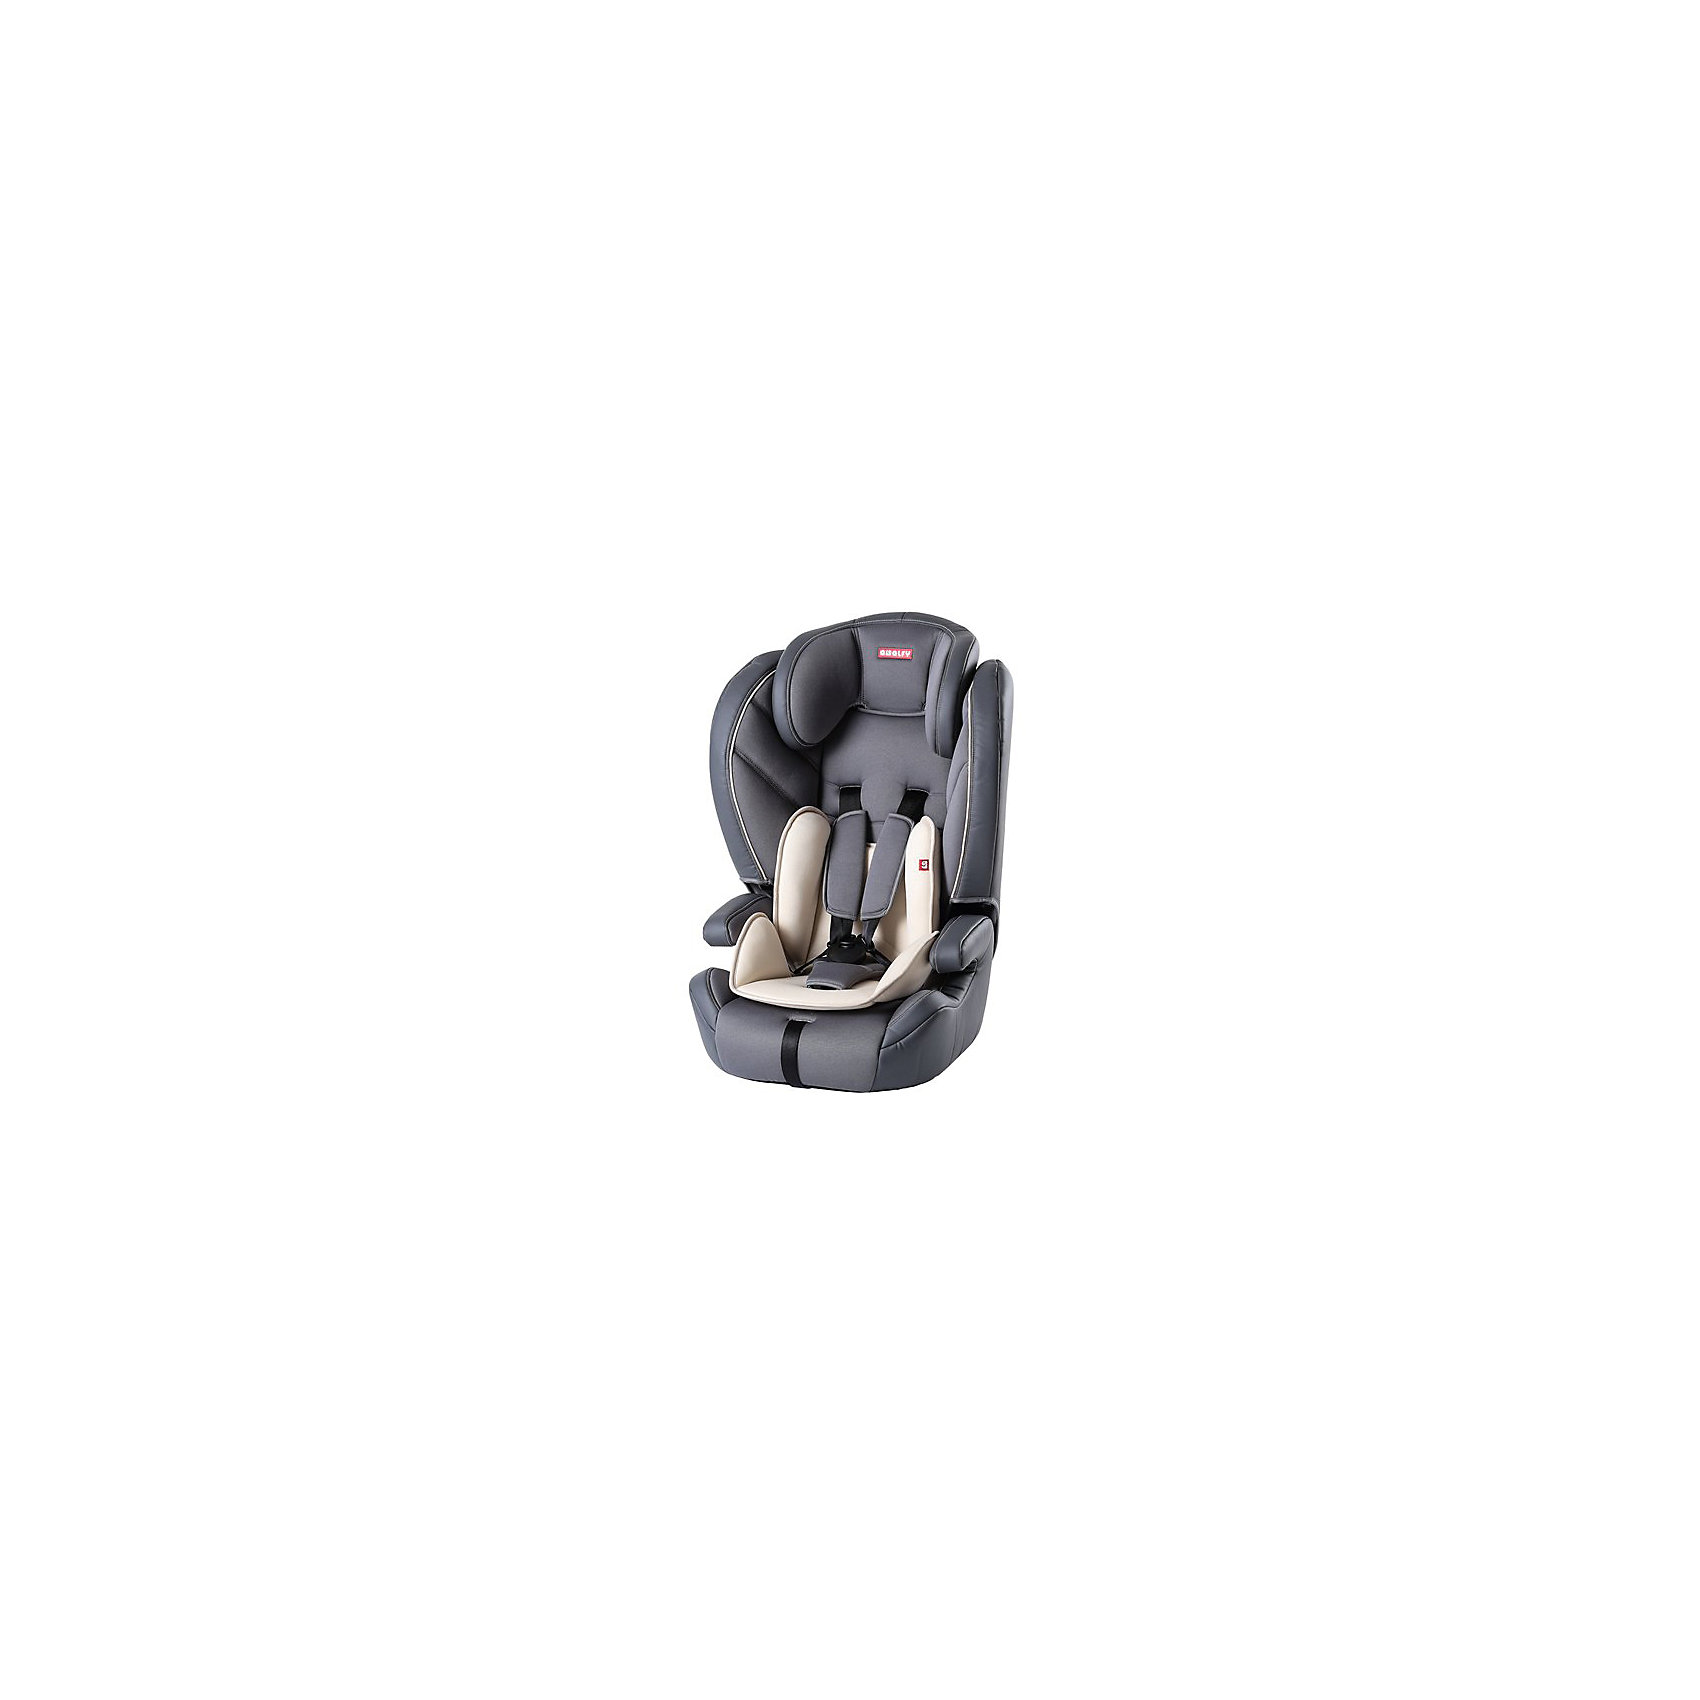 - Автокресло НB-508, 9-36 кг, Amalfy, серый amalfy нb 508 black